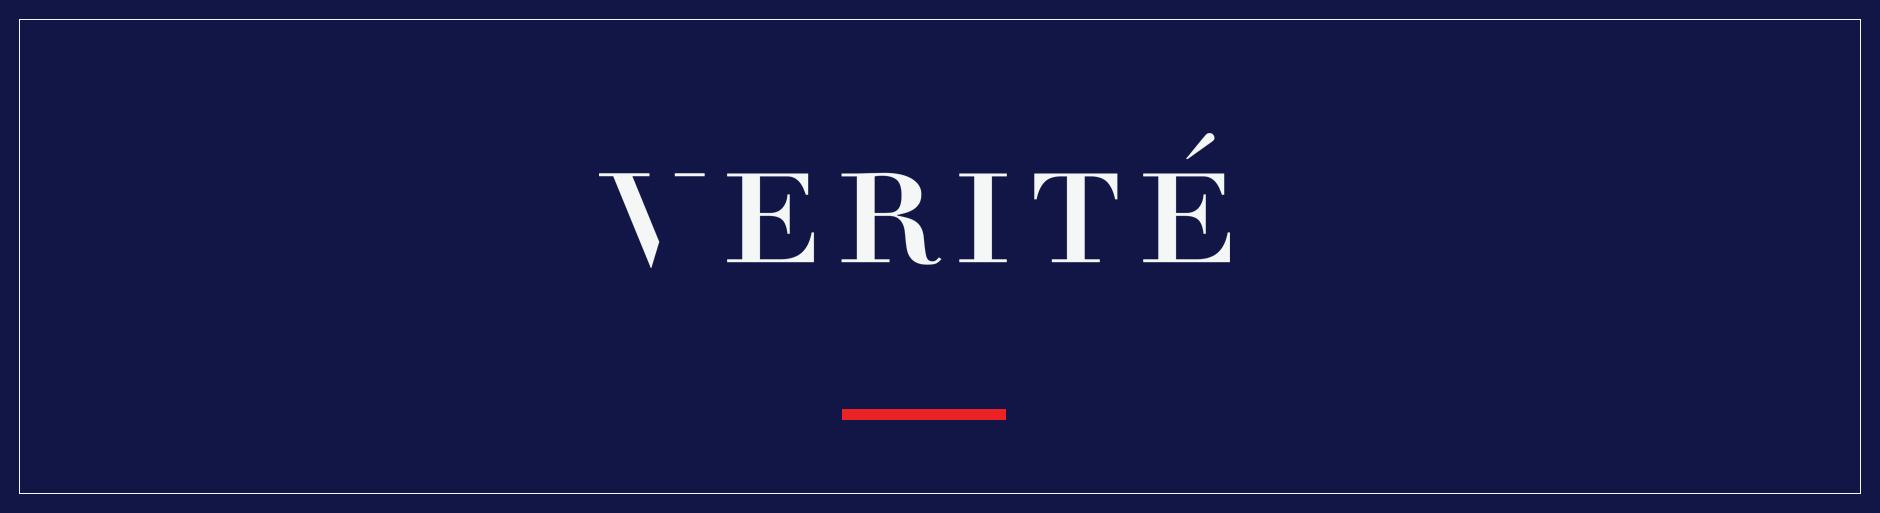 Verite Design Group Inc. Logo Banner